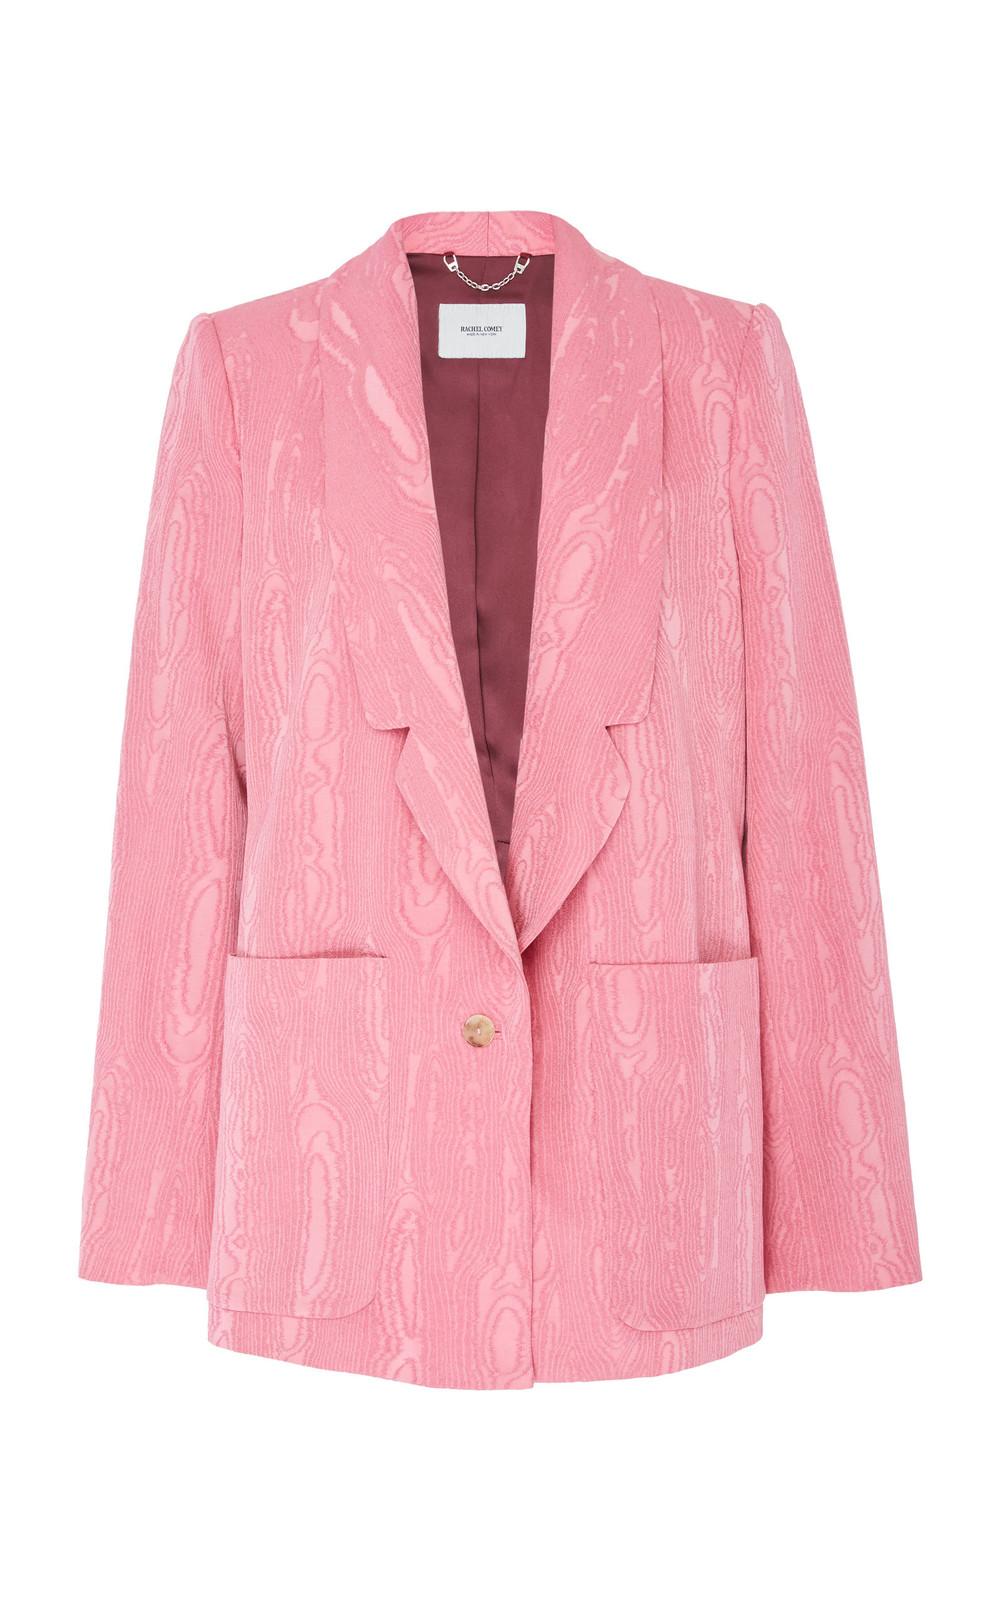 Rachel Comey Lovely Jacquard Blazer in pink